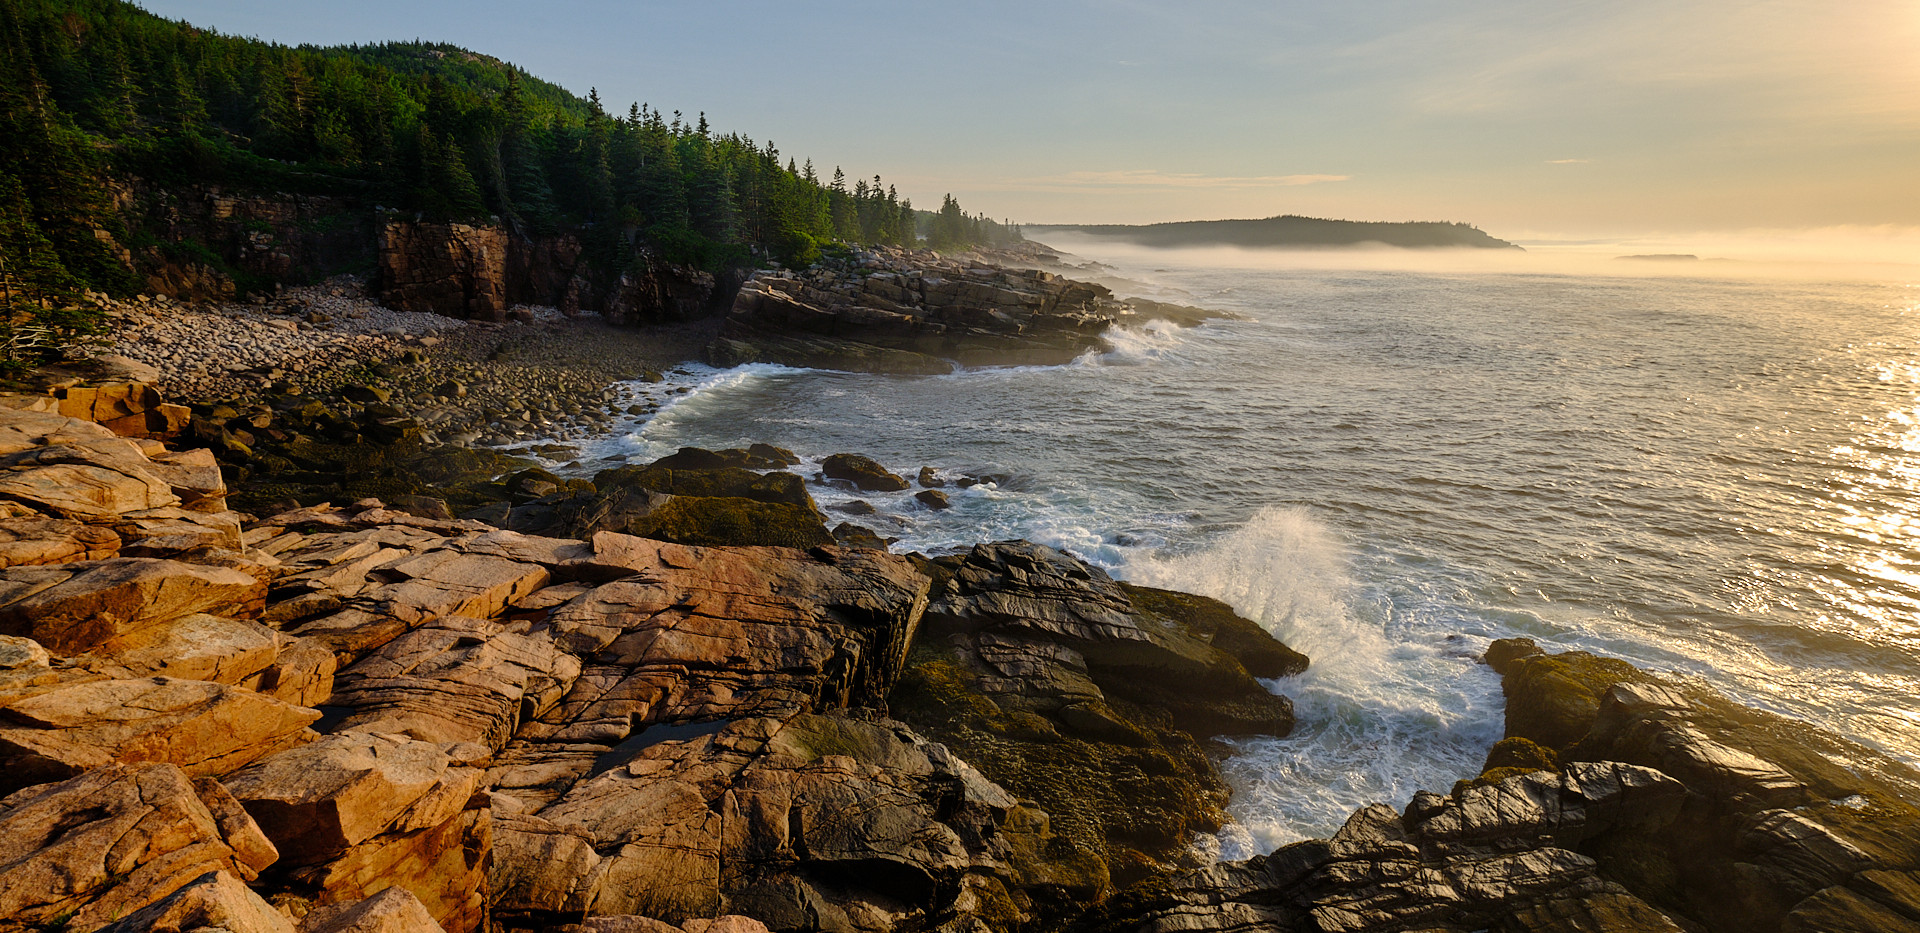 3rd: Acadia